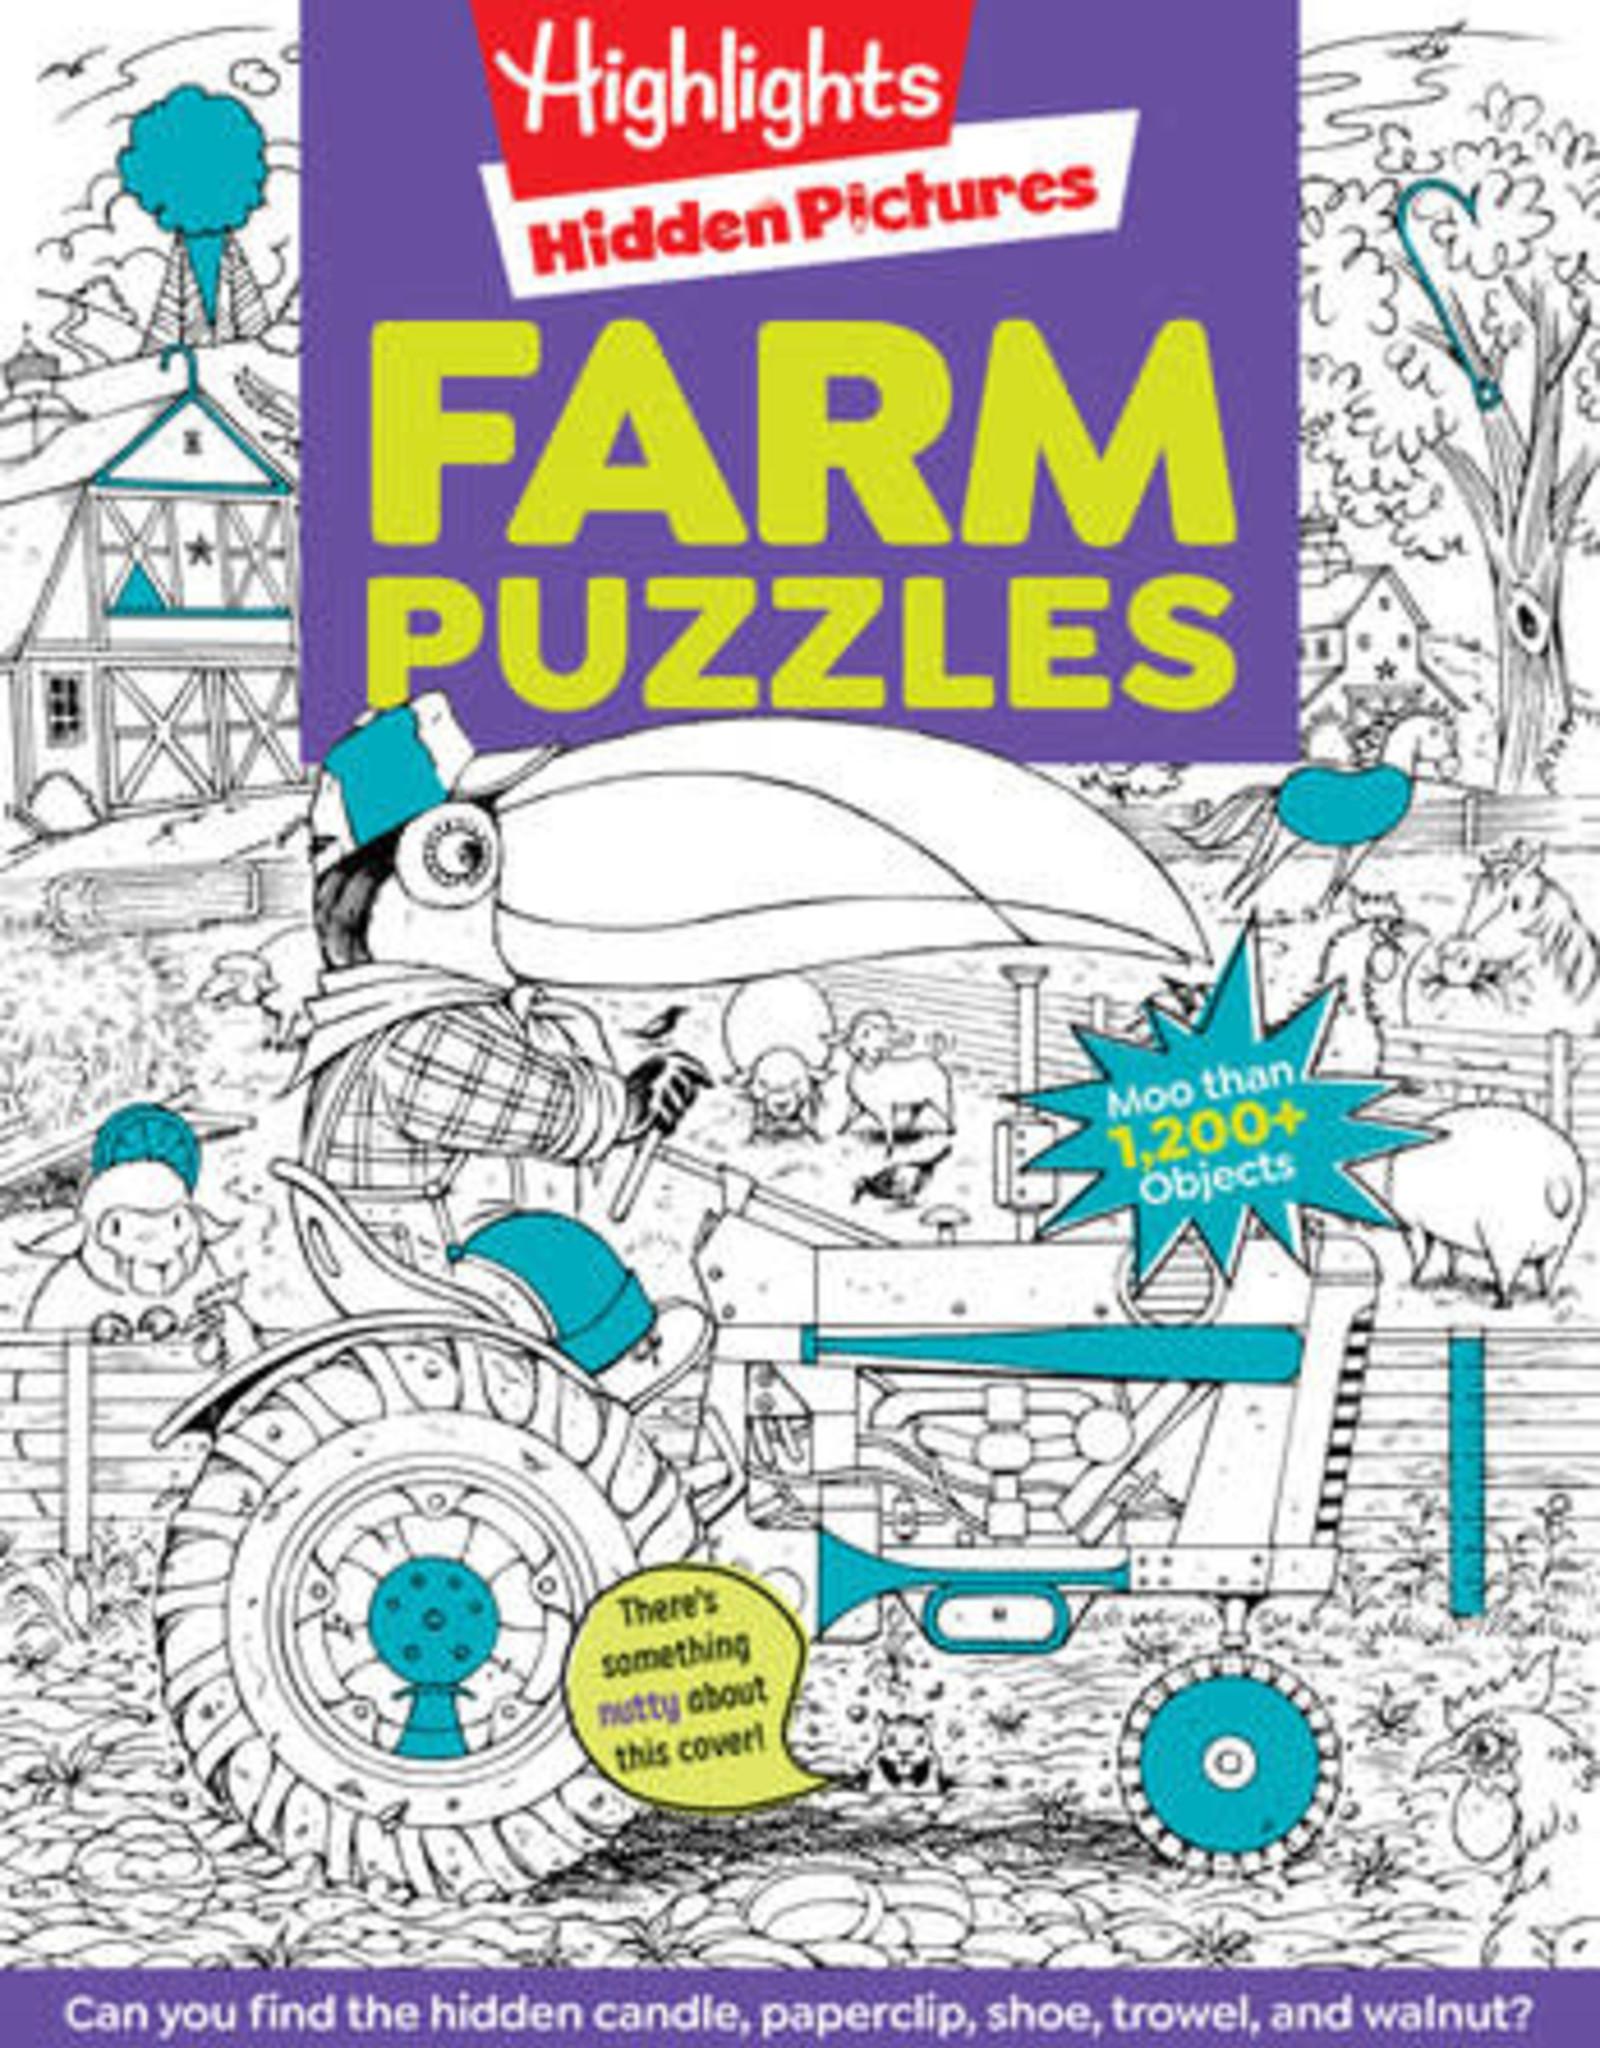 Highlights Farm Puzzles